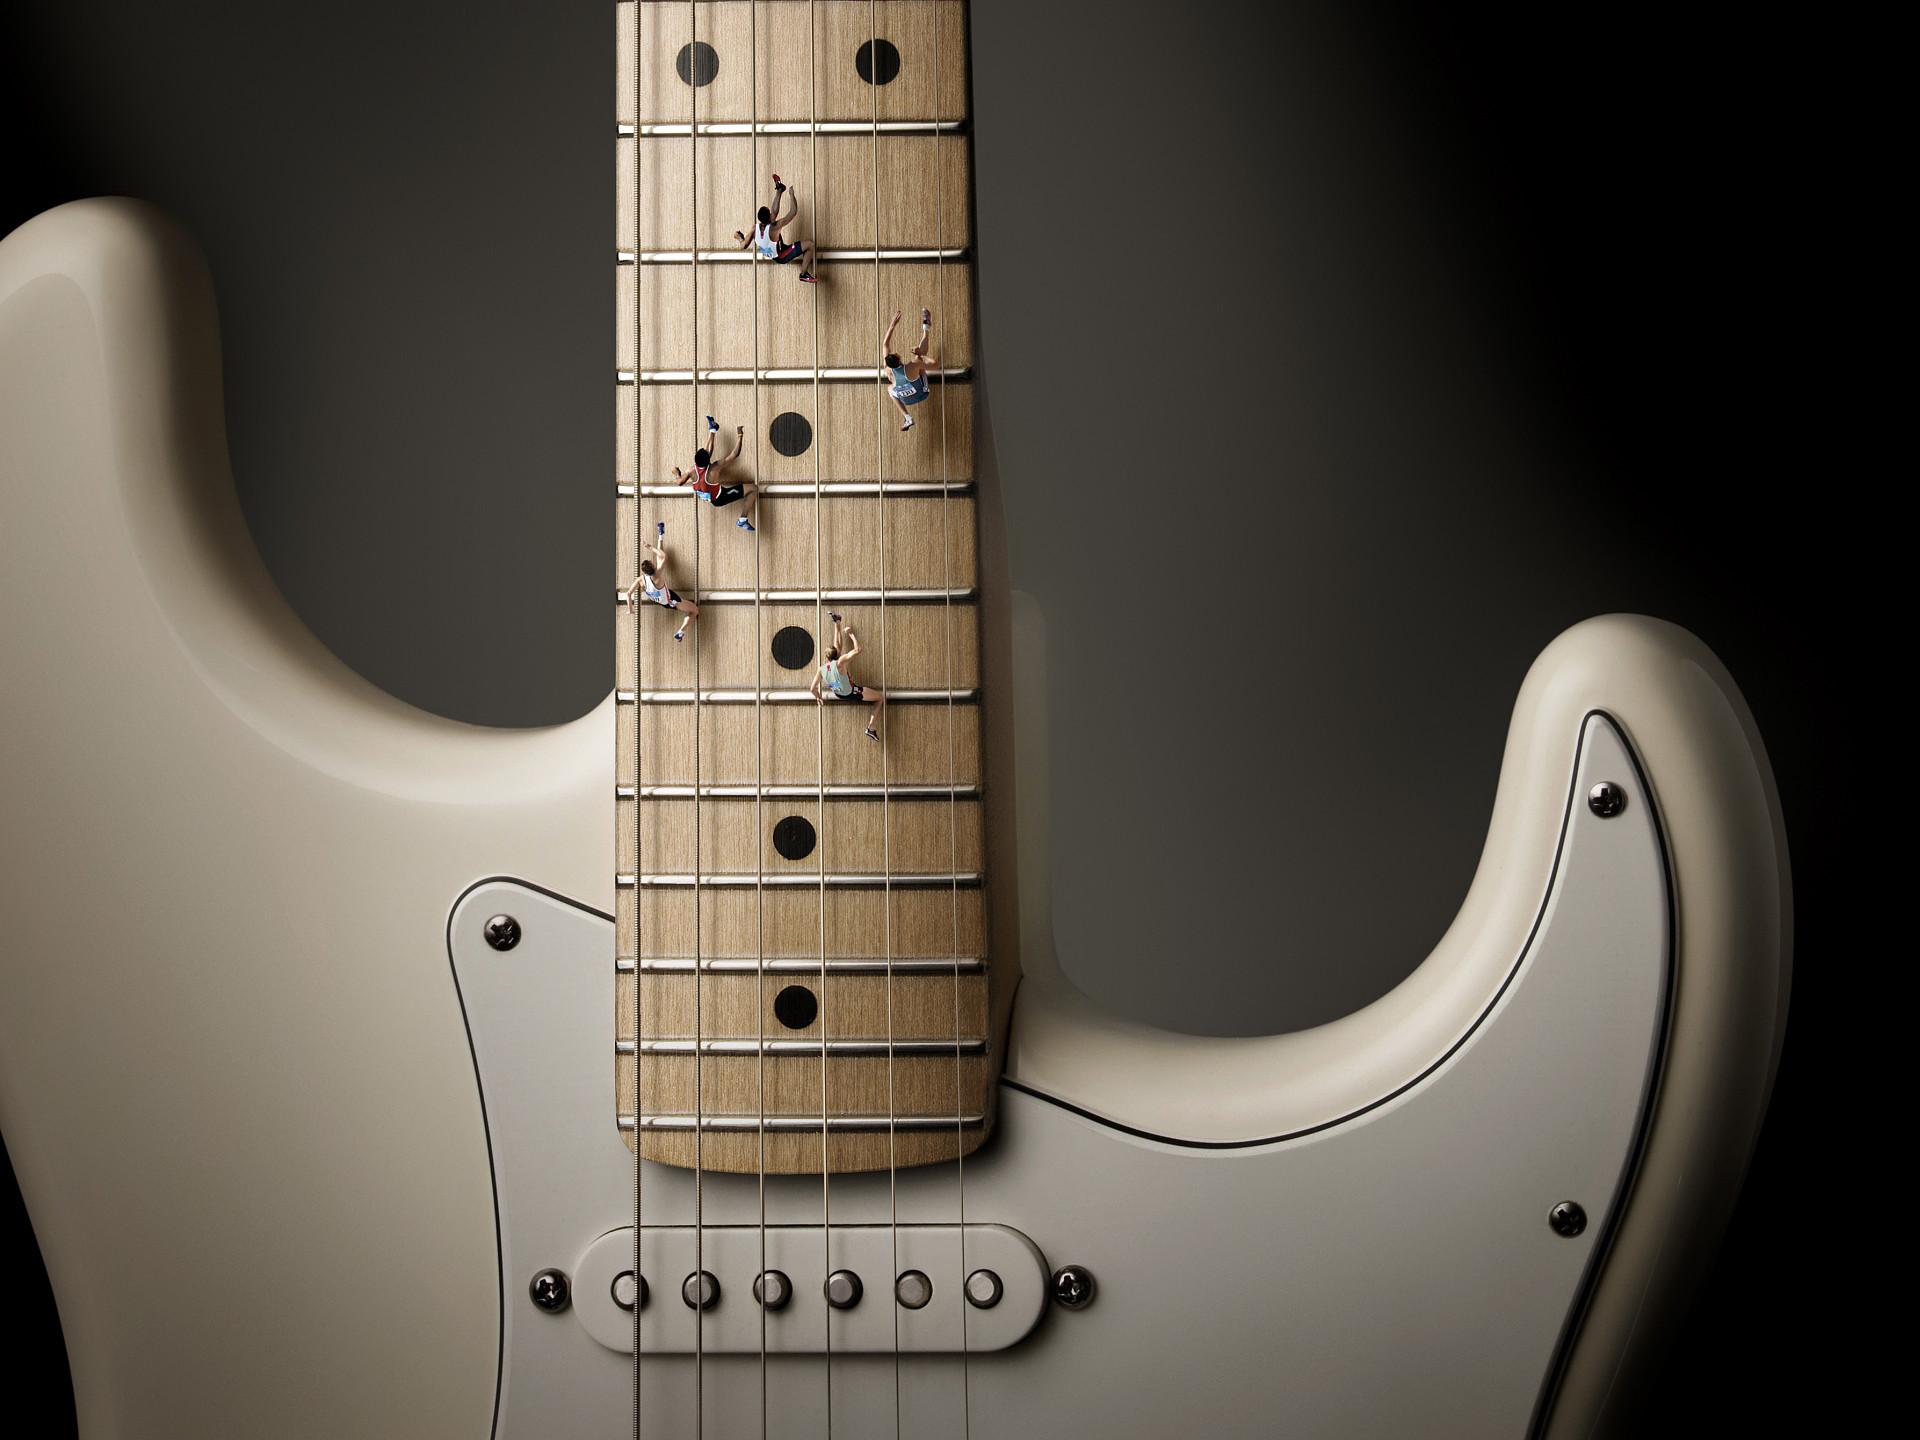 Fender Wallpaper 56 Pictures